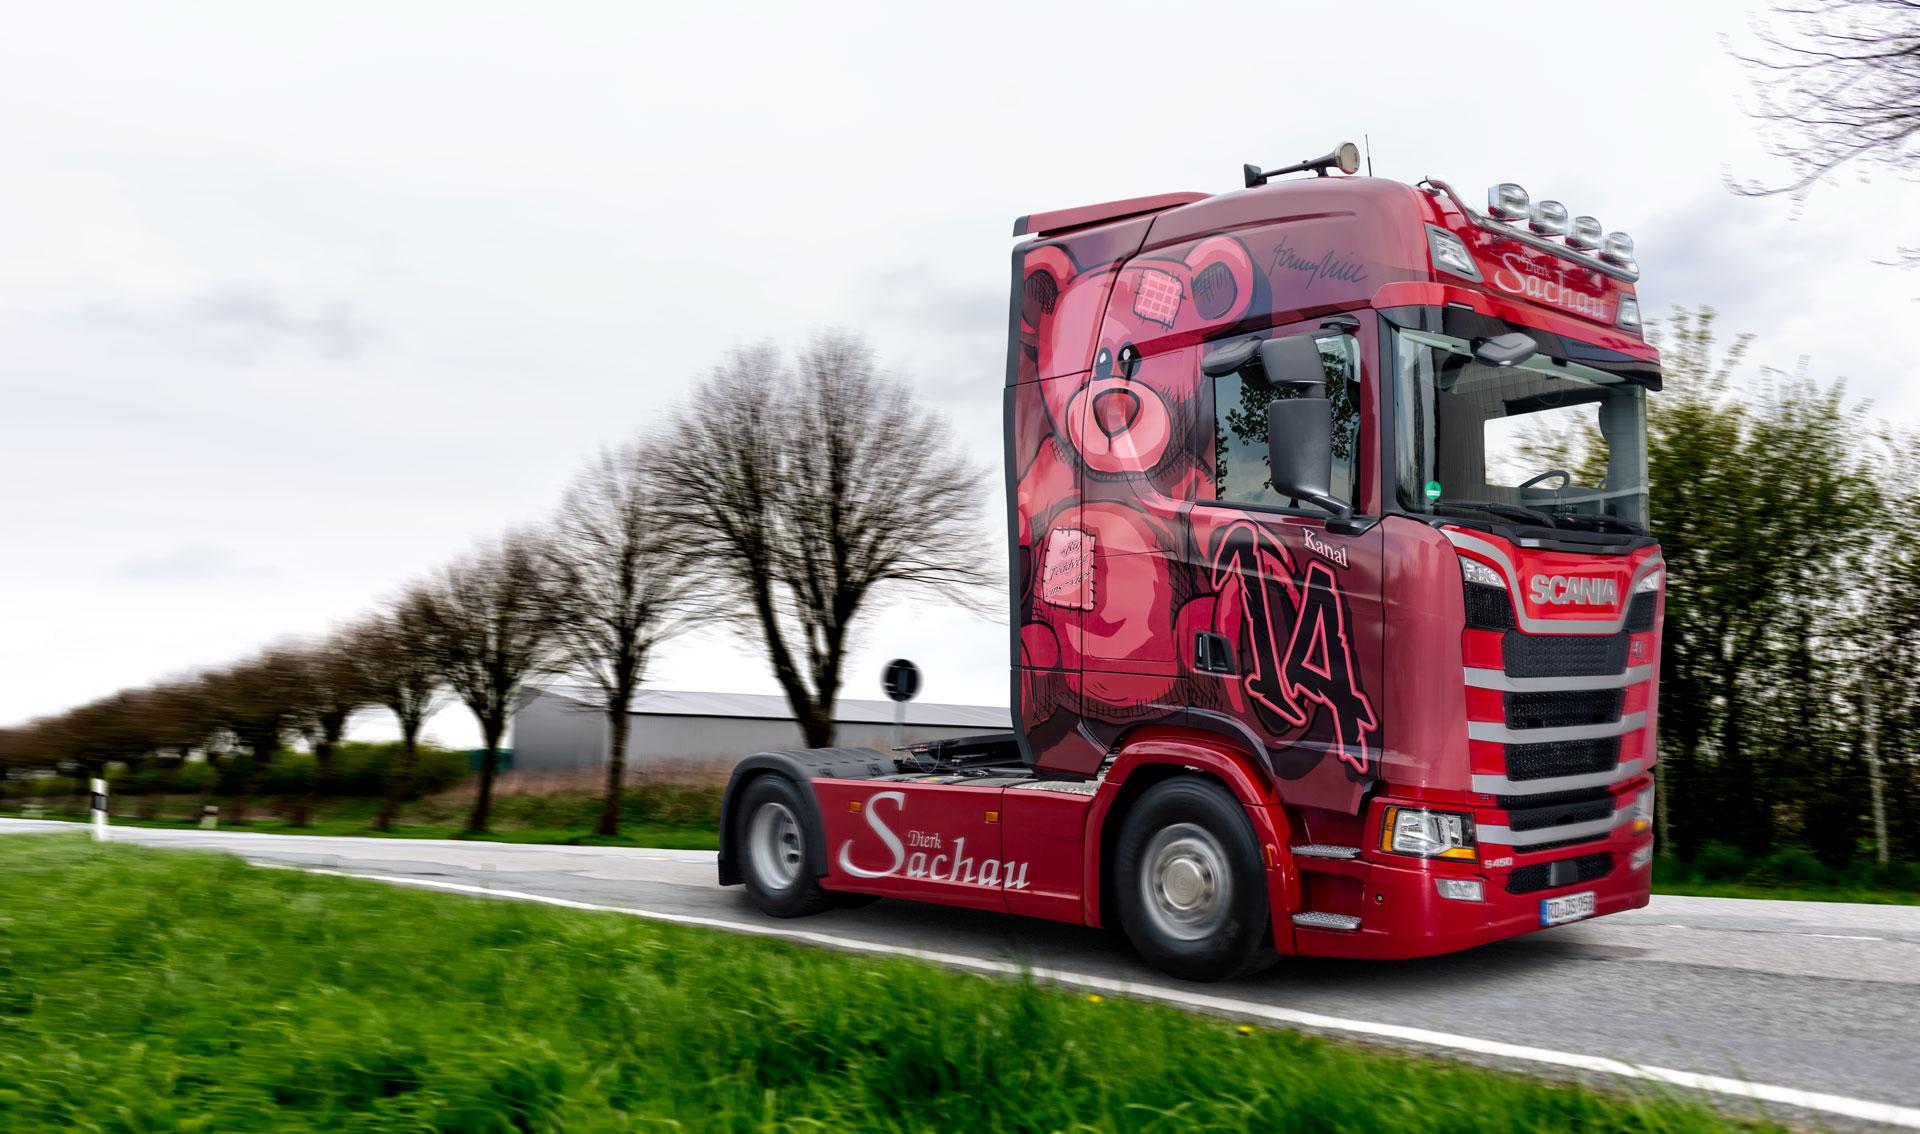 Spedition Sachau Hohenwestedt Scania 02